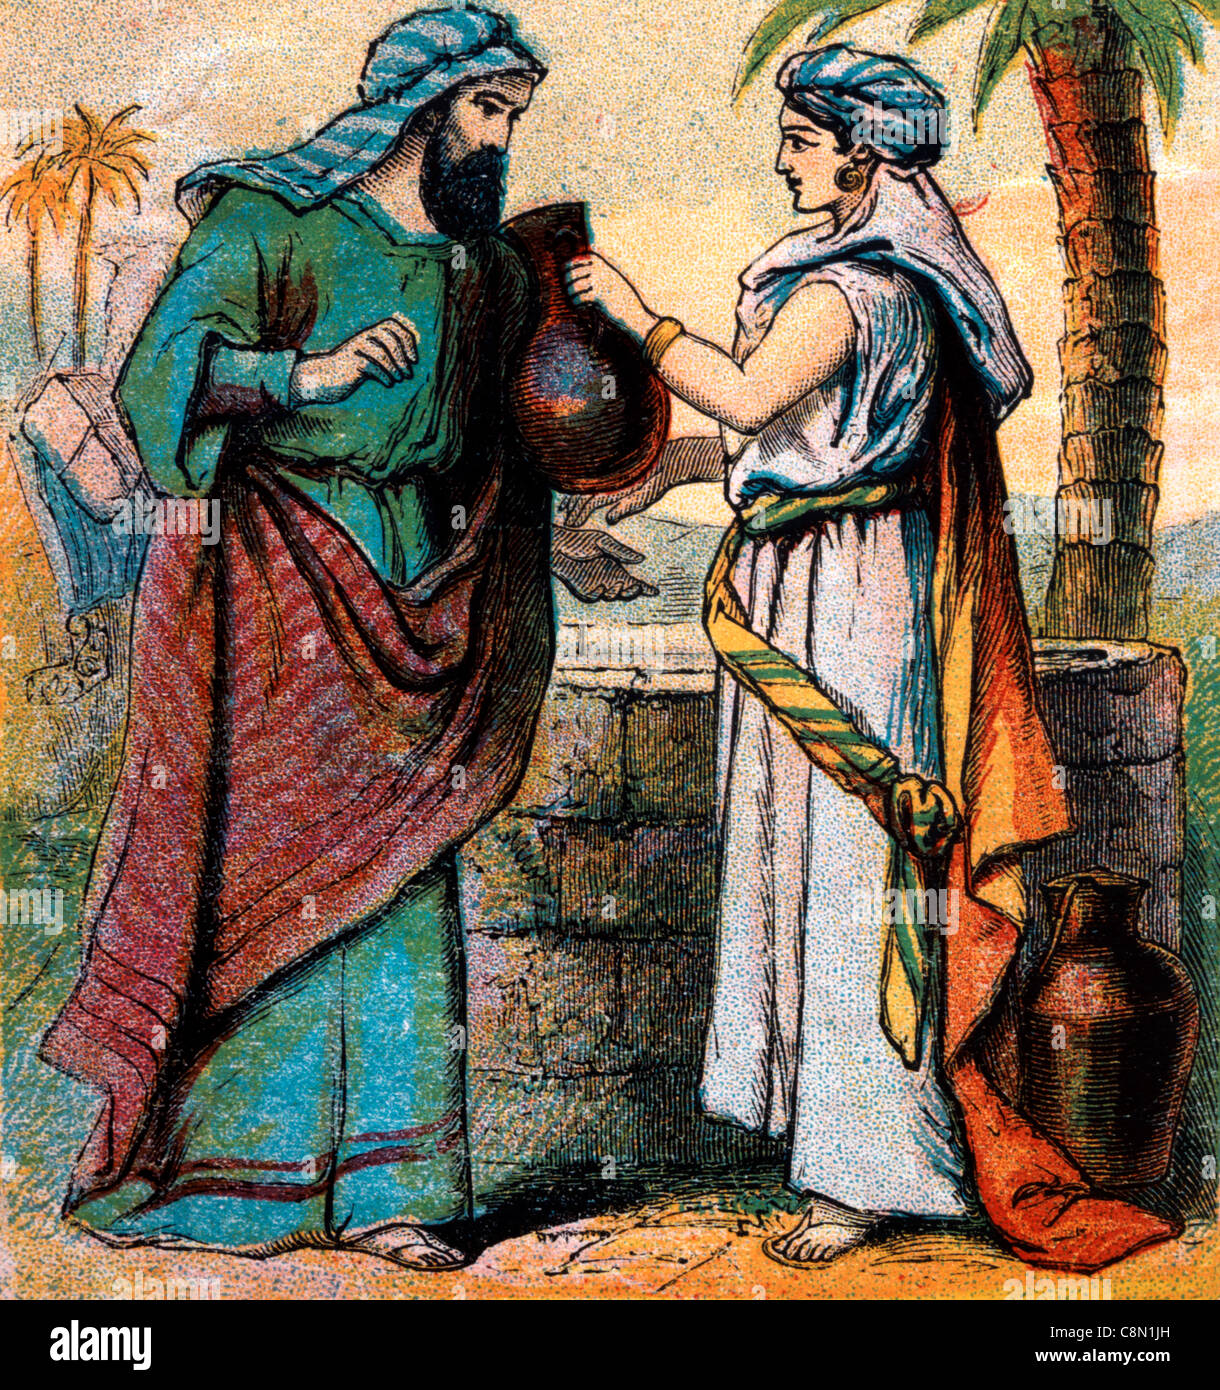 bible stories illustration of rebekah offering water to abraham u0027s